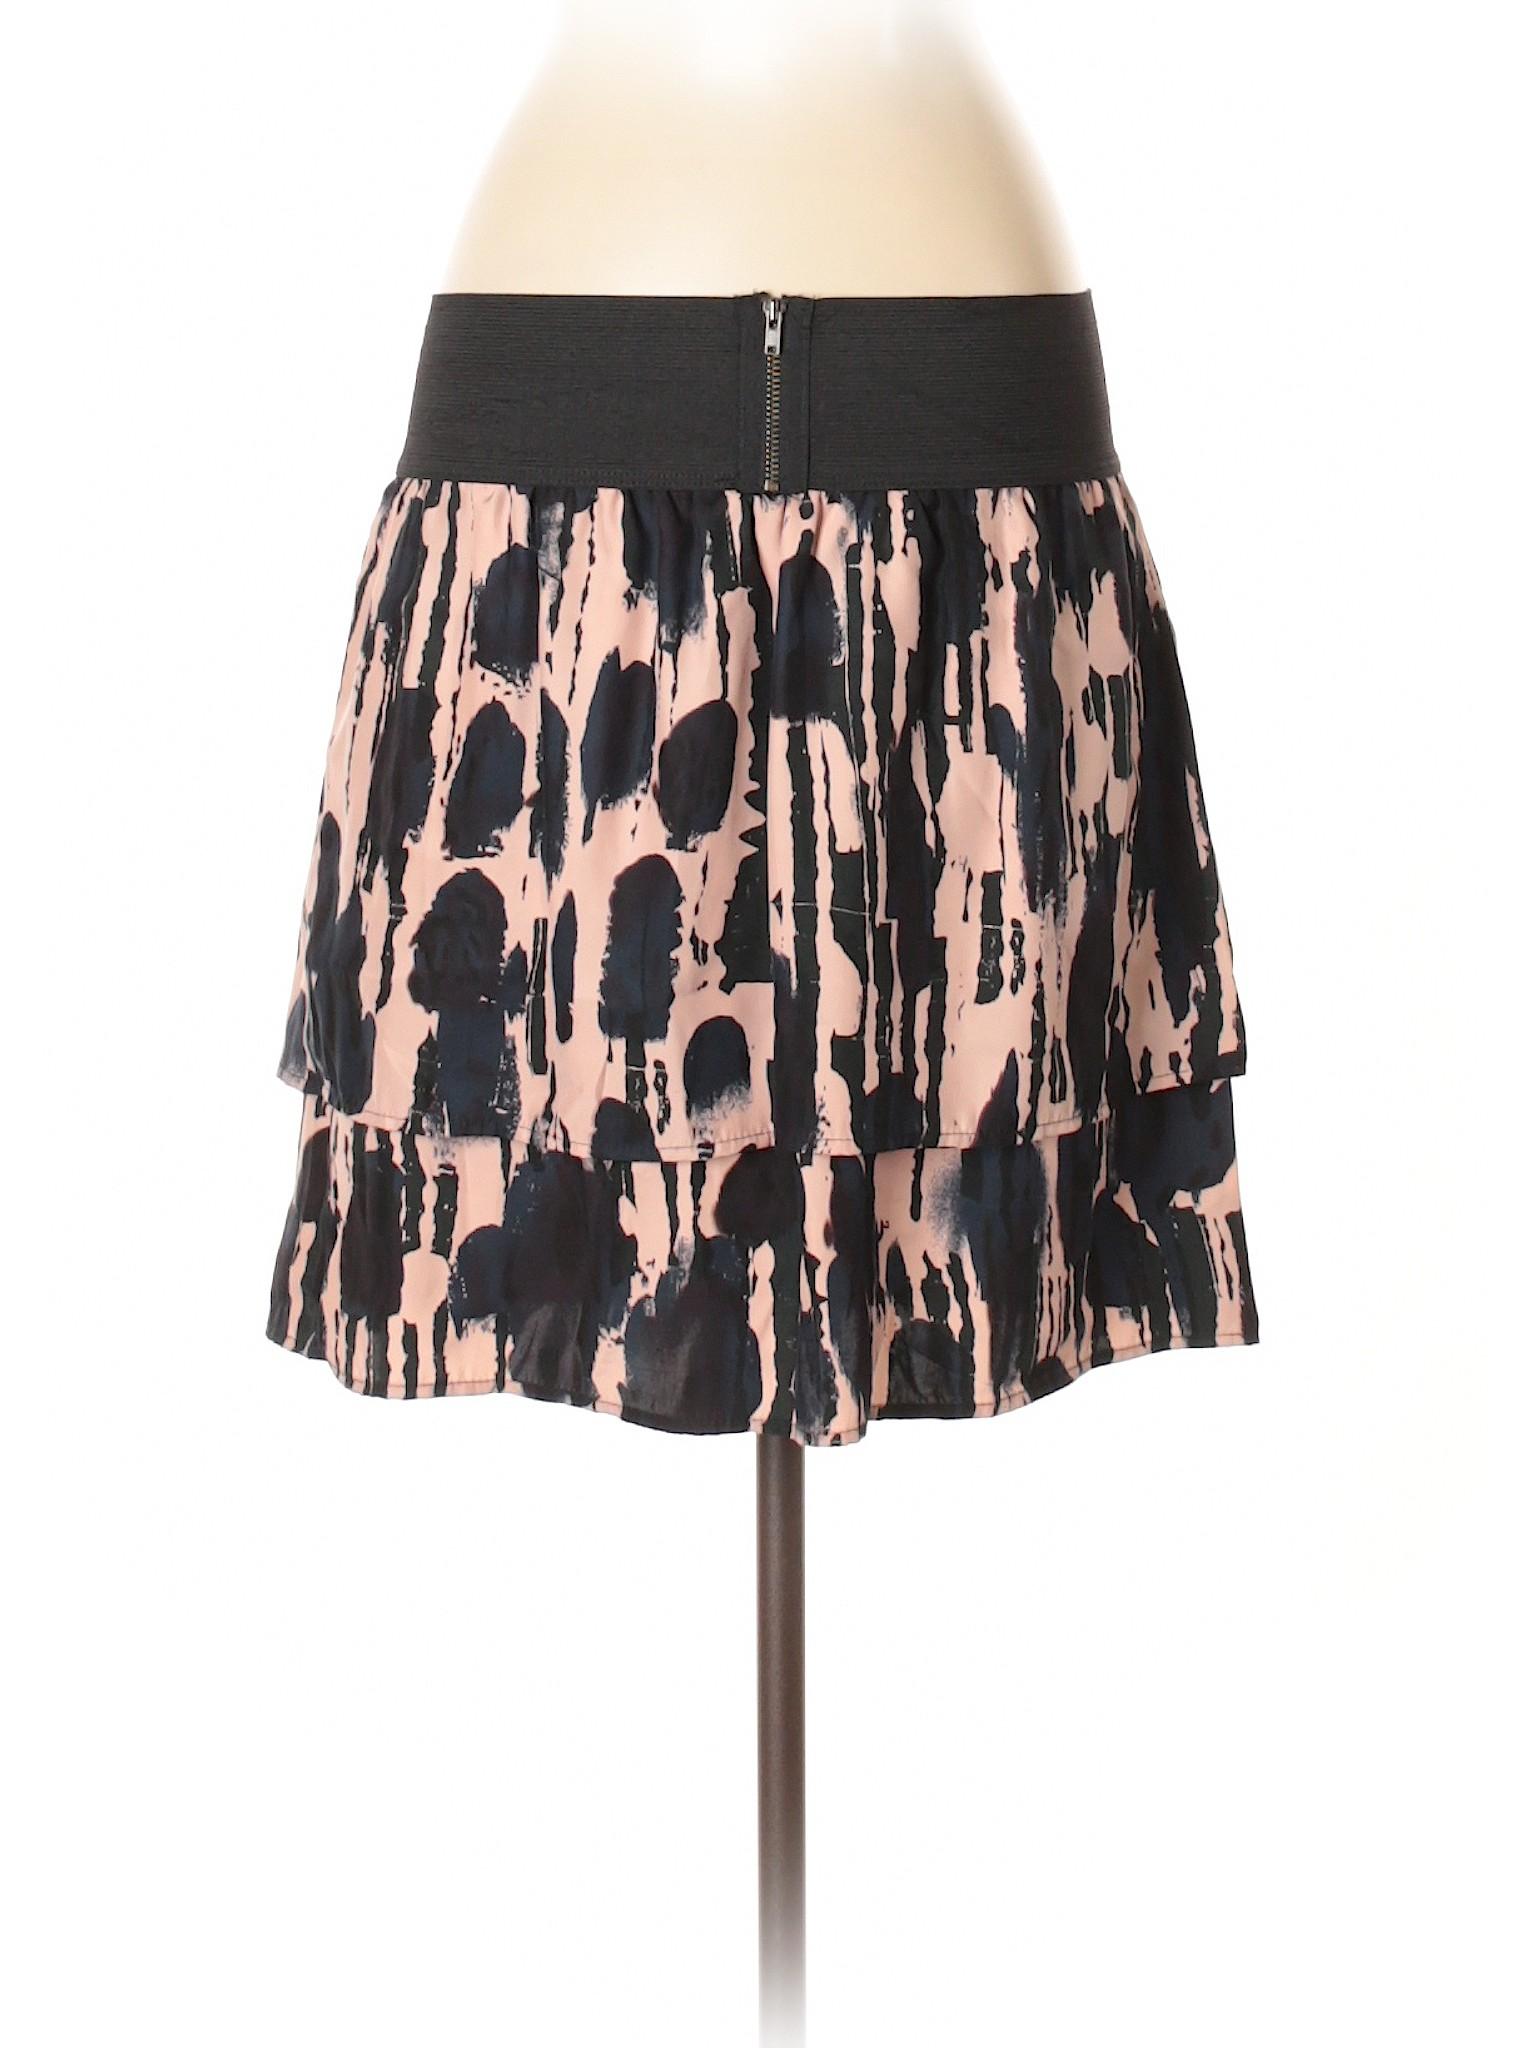 Boutique Skirt Silk Boutique leisure Aqua leisure rwRaYRxqP